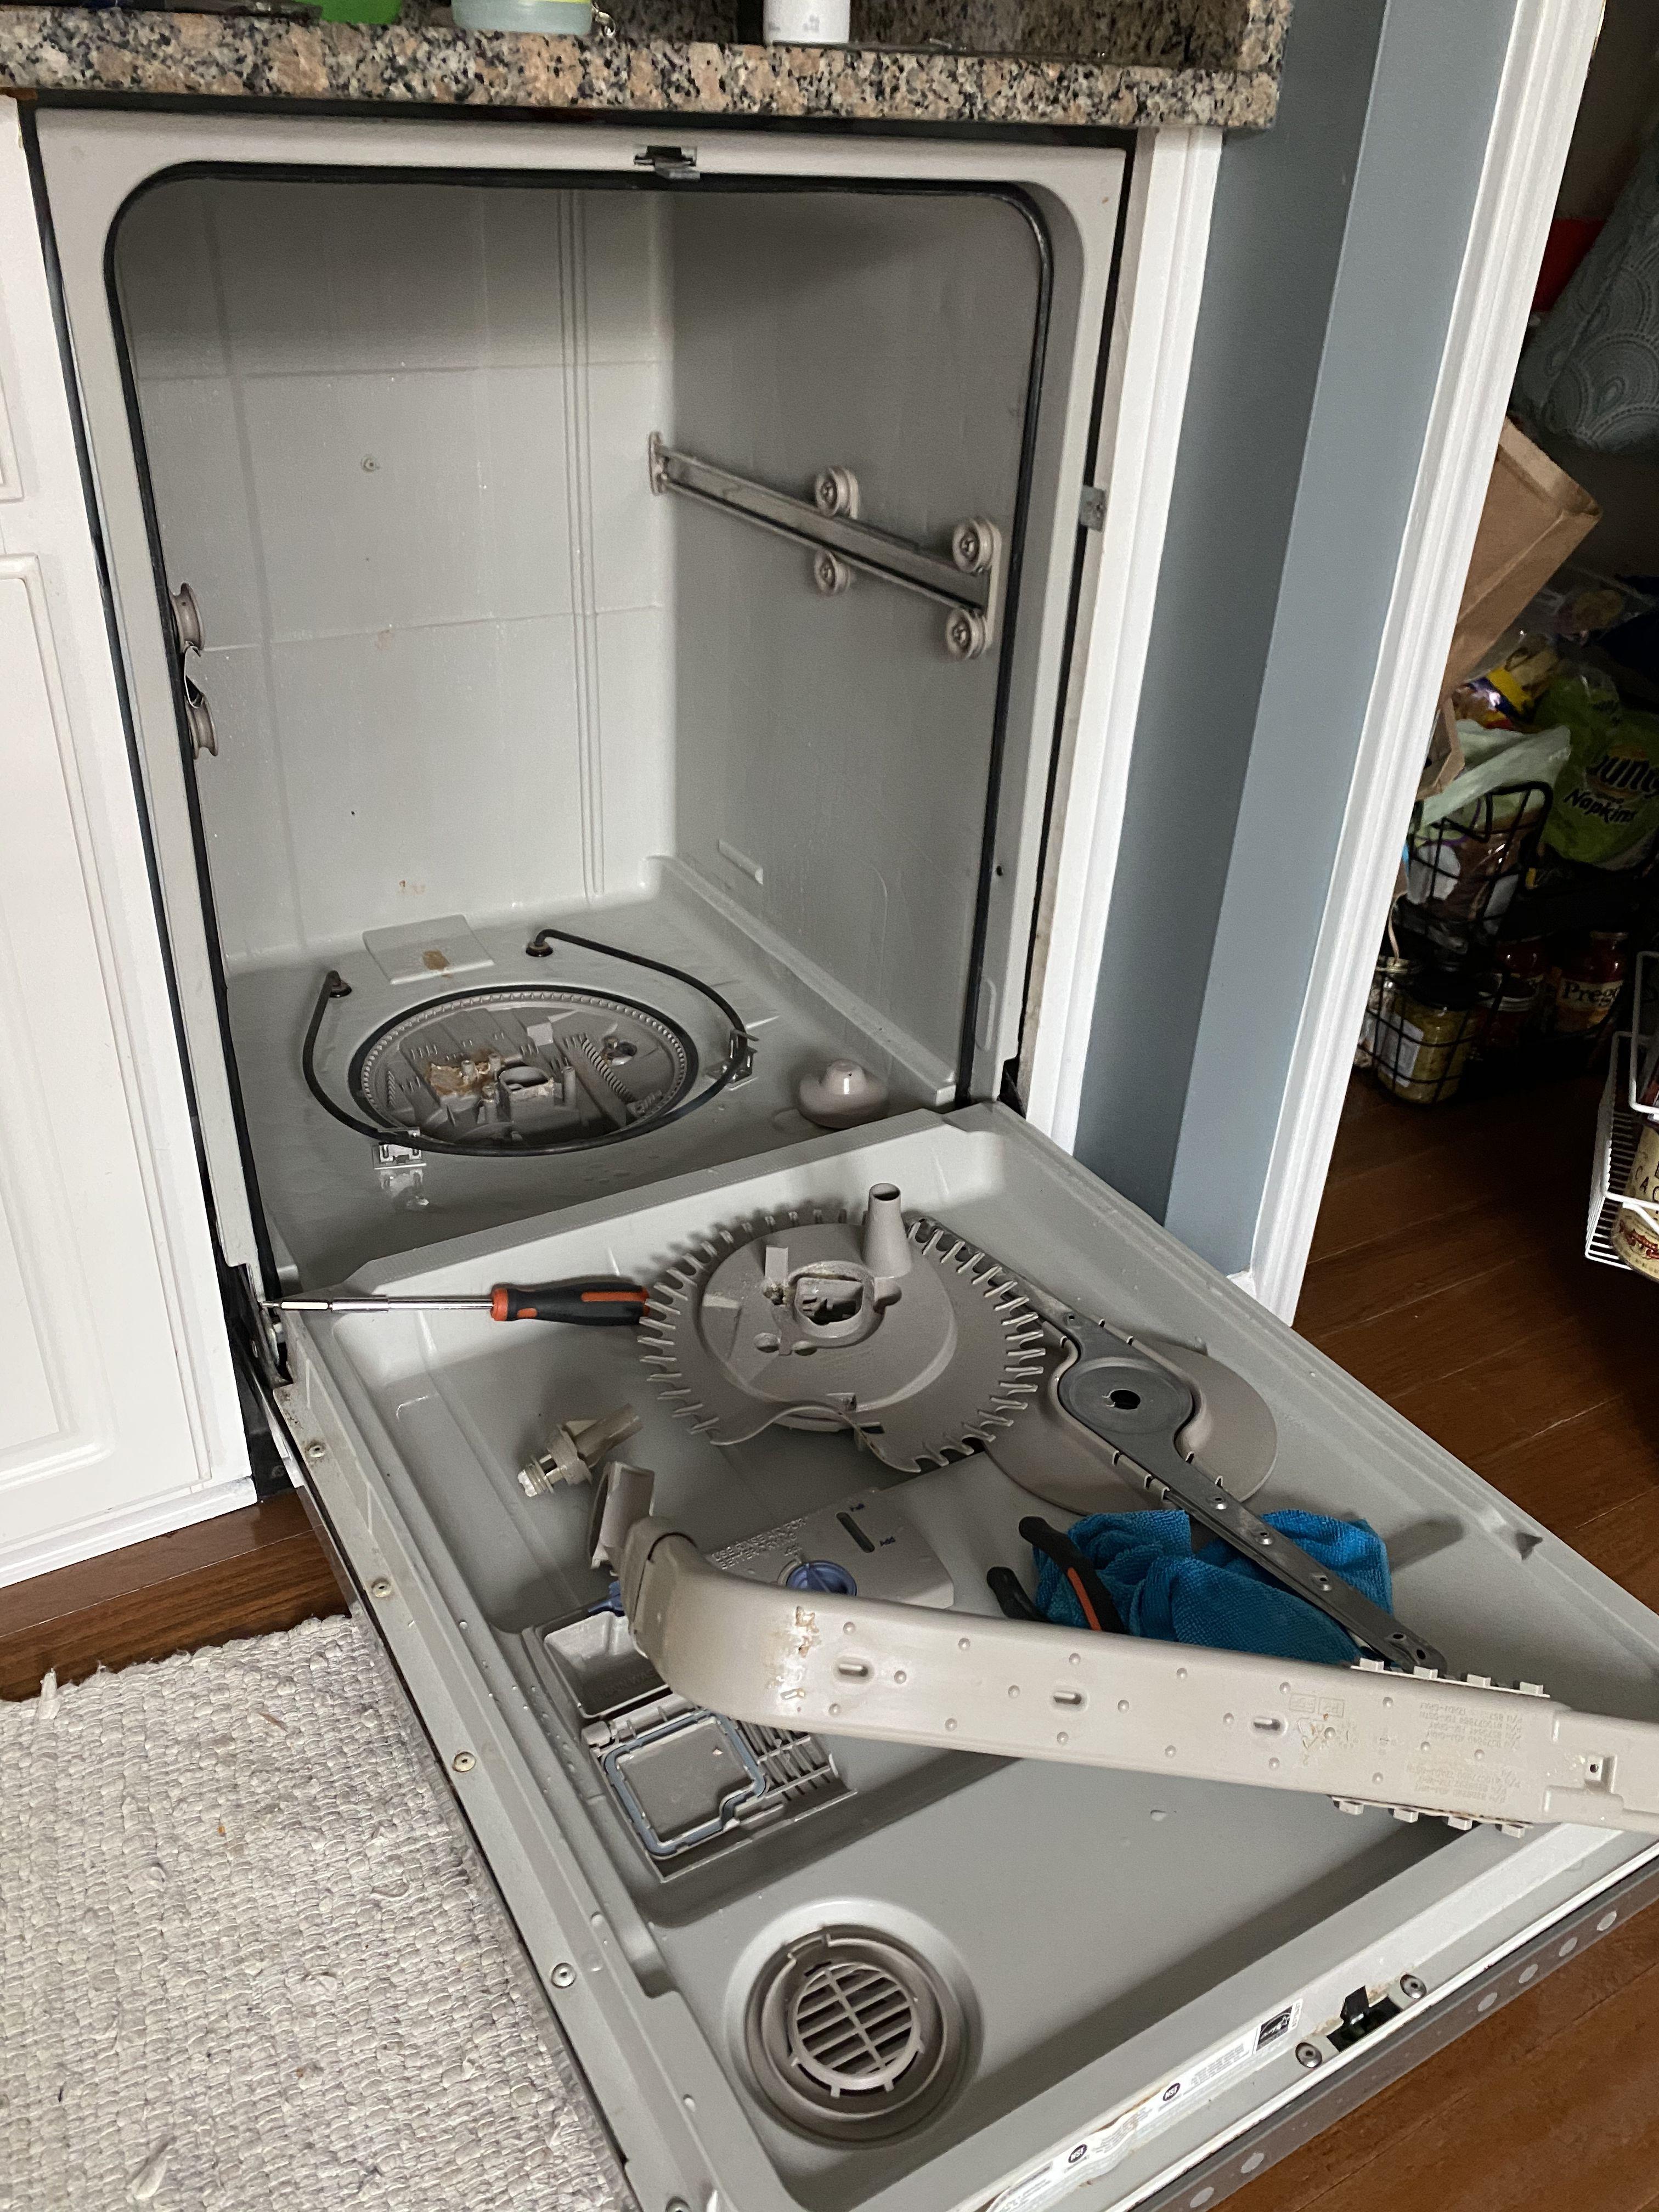 Change dishwasher filter in 2020 change dishwasher